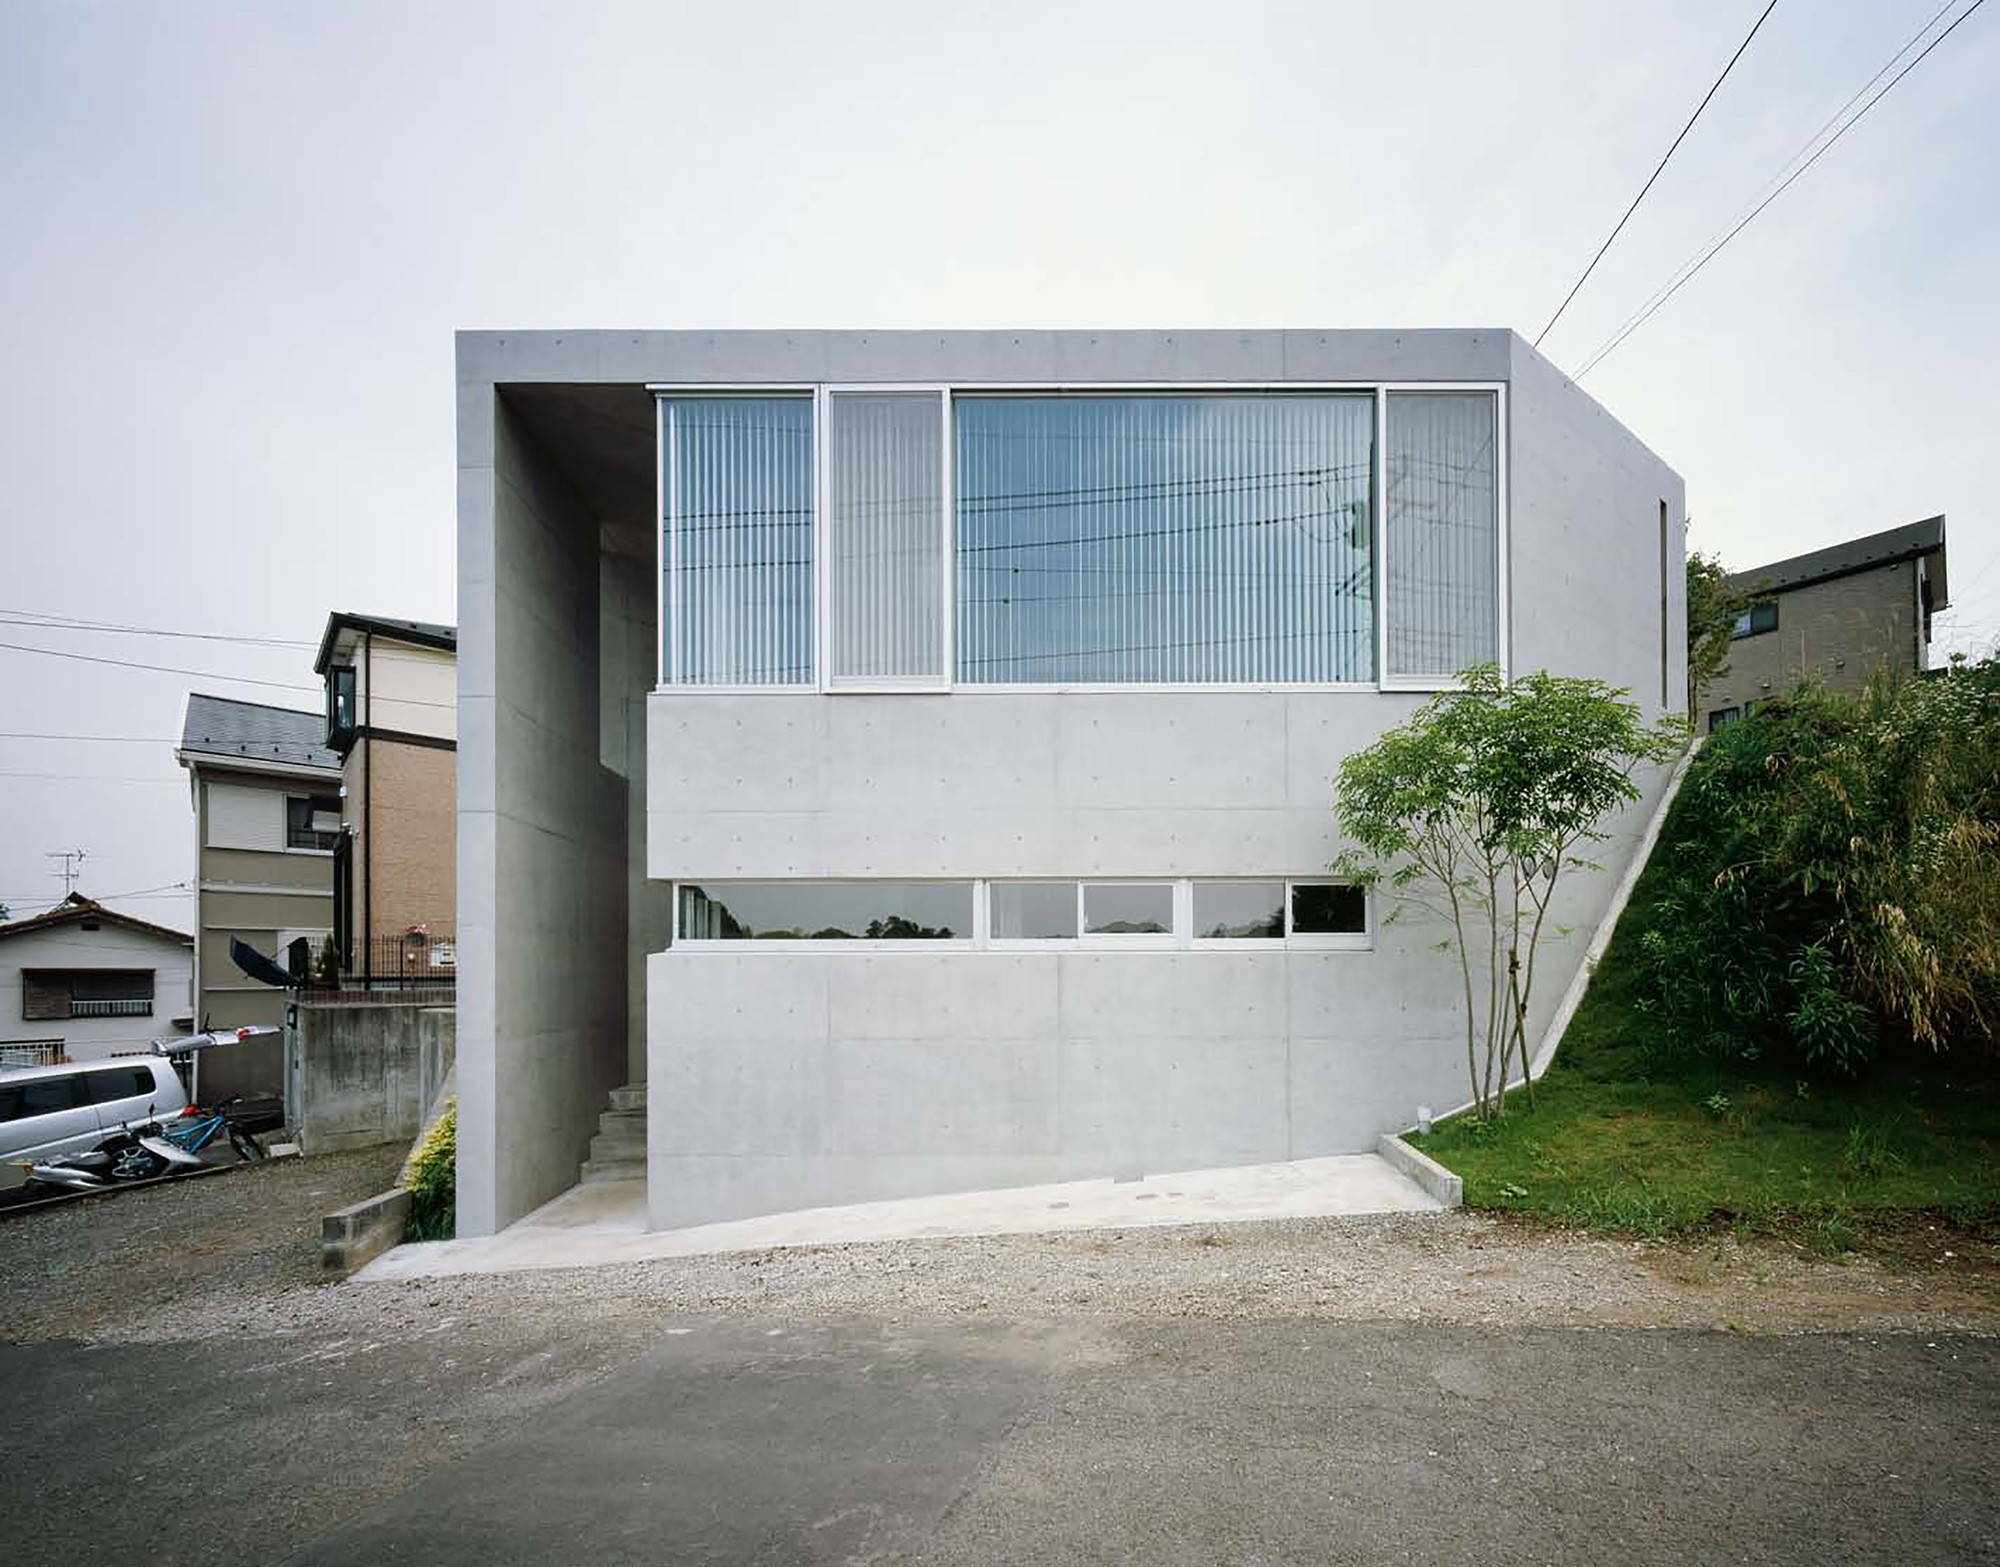 House in Atsugi / Naoya Kawabe Architect & Associates, © Takumi Ota